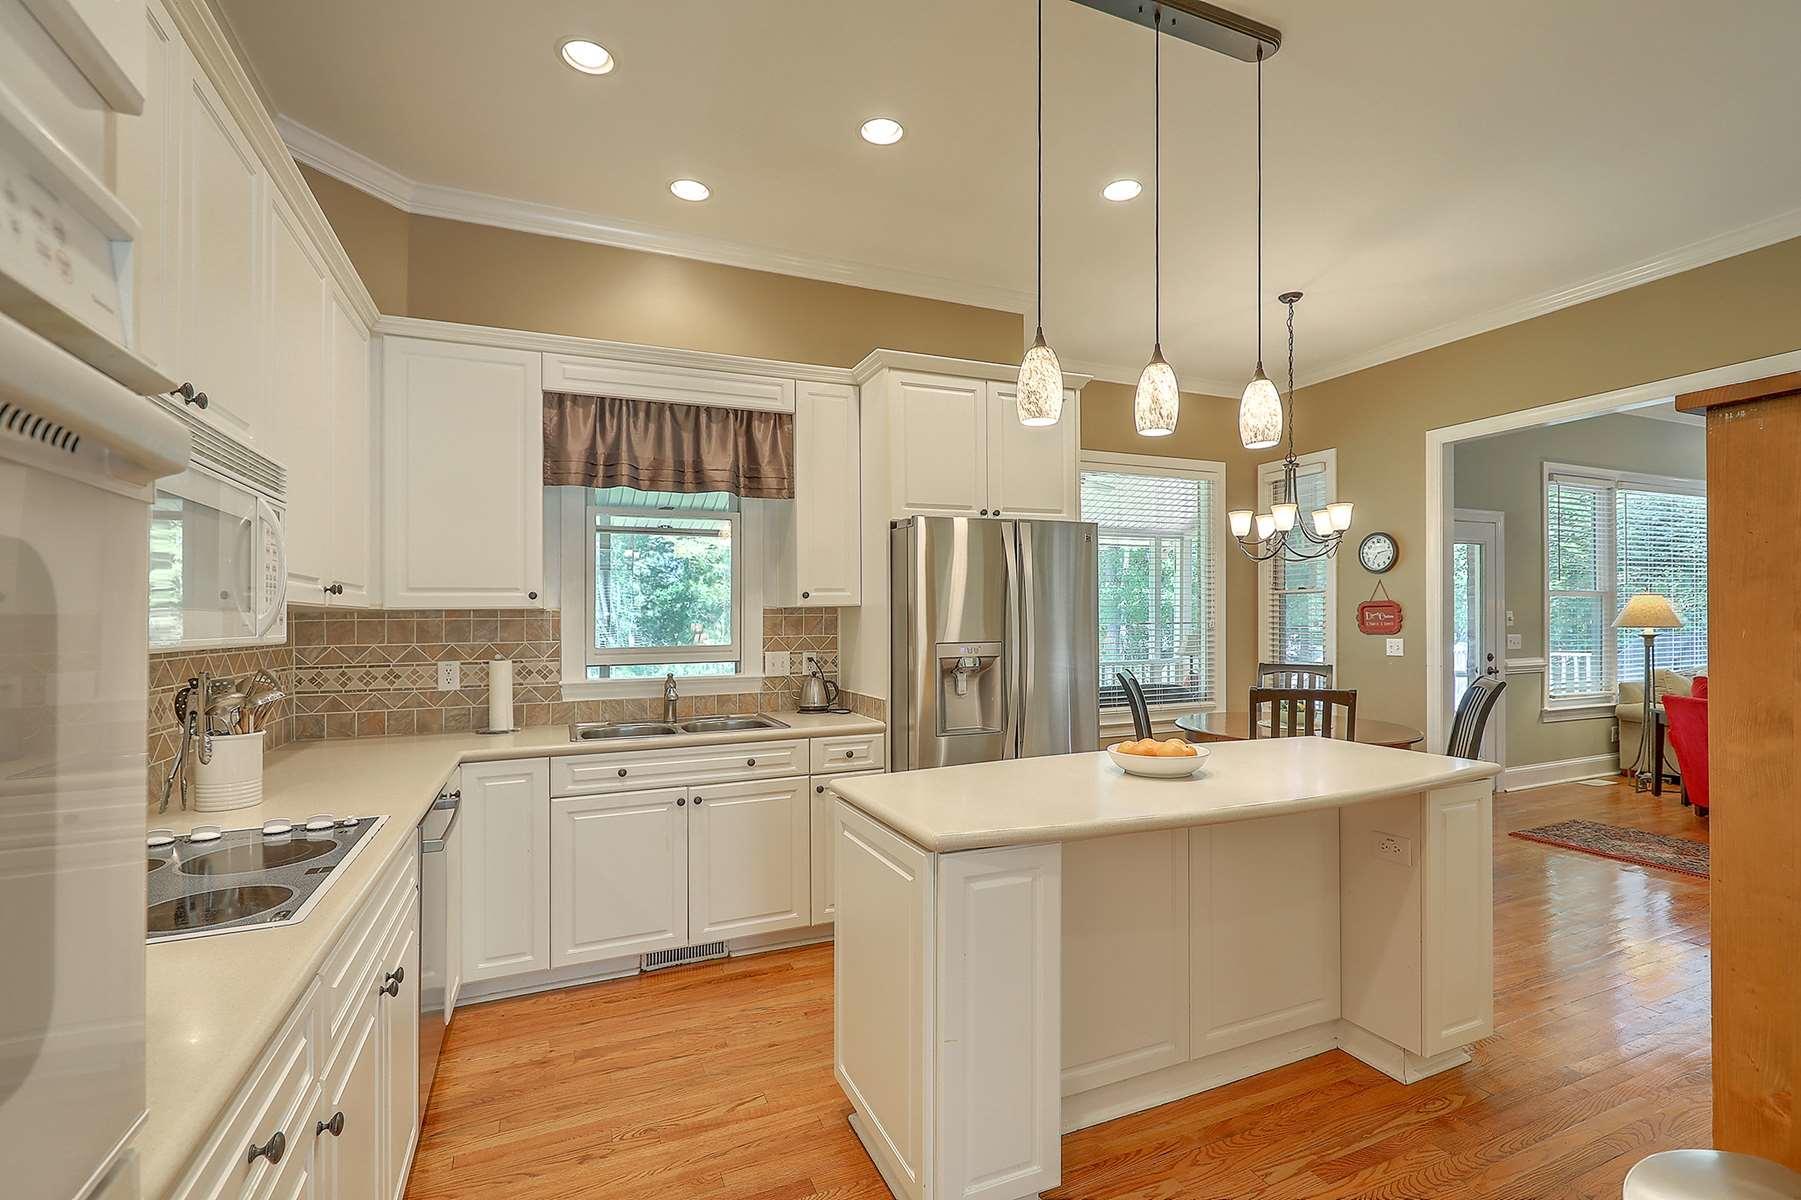 Dunes West Homes For Sale - 2961 Pignatelli, Mount Pleasant, SC - 7